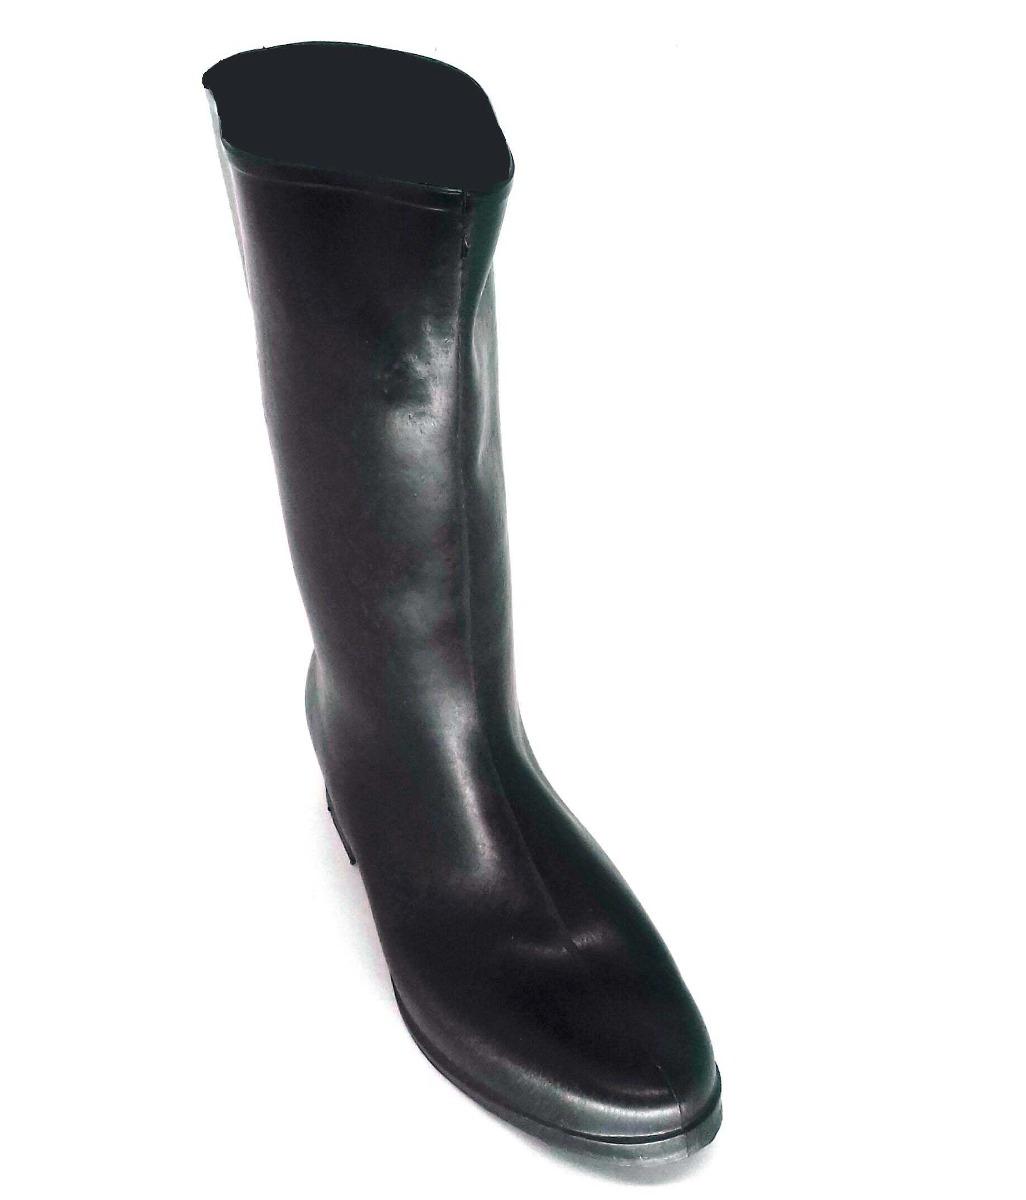 f82bd7179d bota borracha galocha chuva feminina piracapas cano longo. Carregando zoom.